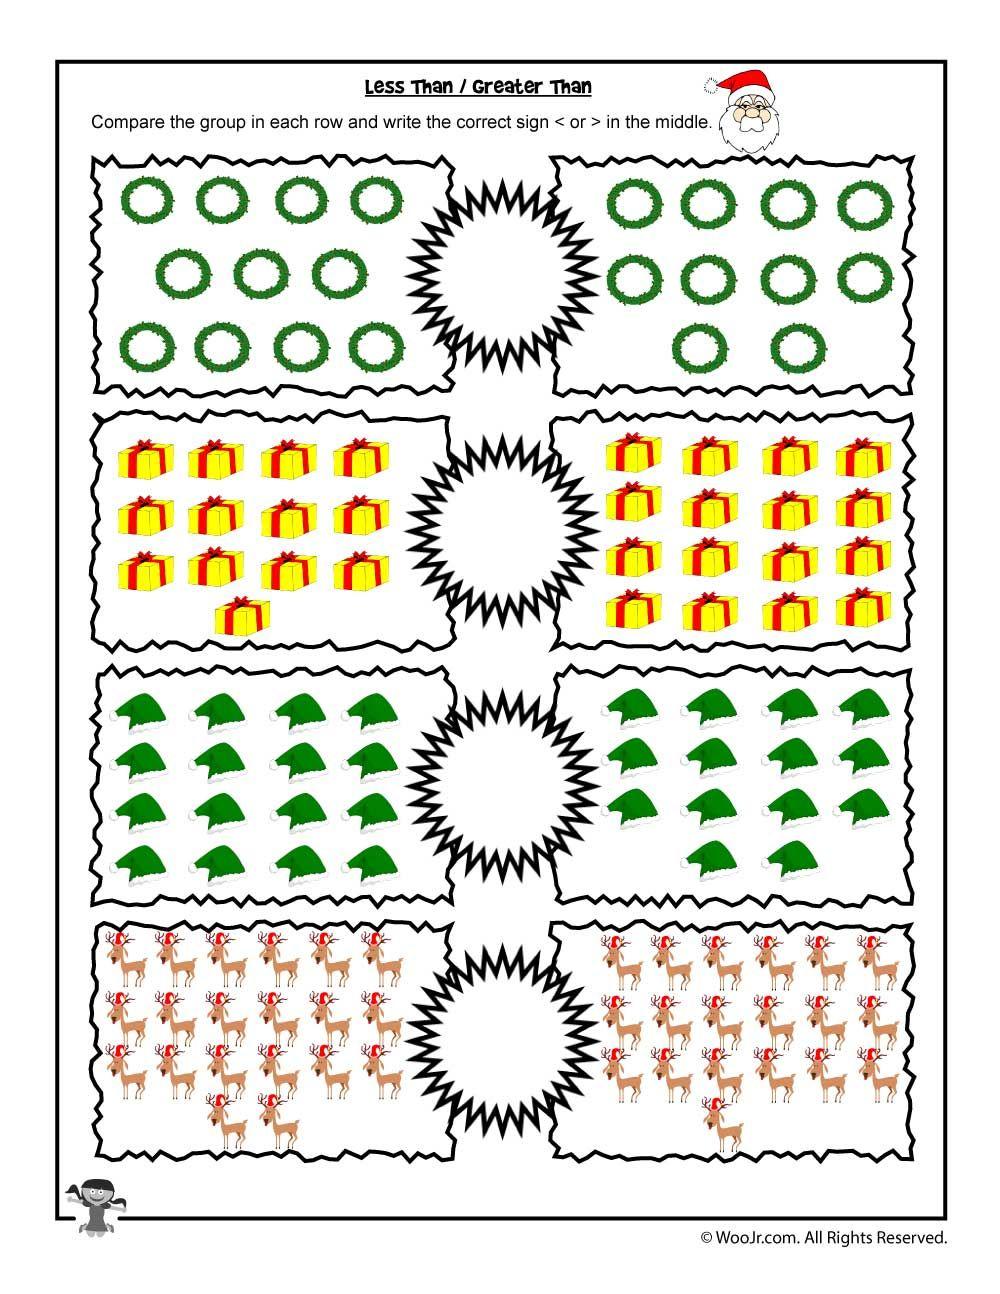 Easy 1 20 Greater Than Less Than Worksheet Woo Jr Kids Activities Math Worksheets Kindergarten Worksheets Kindergarten Worksheets Printable